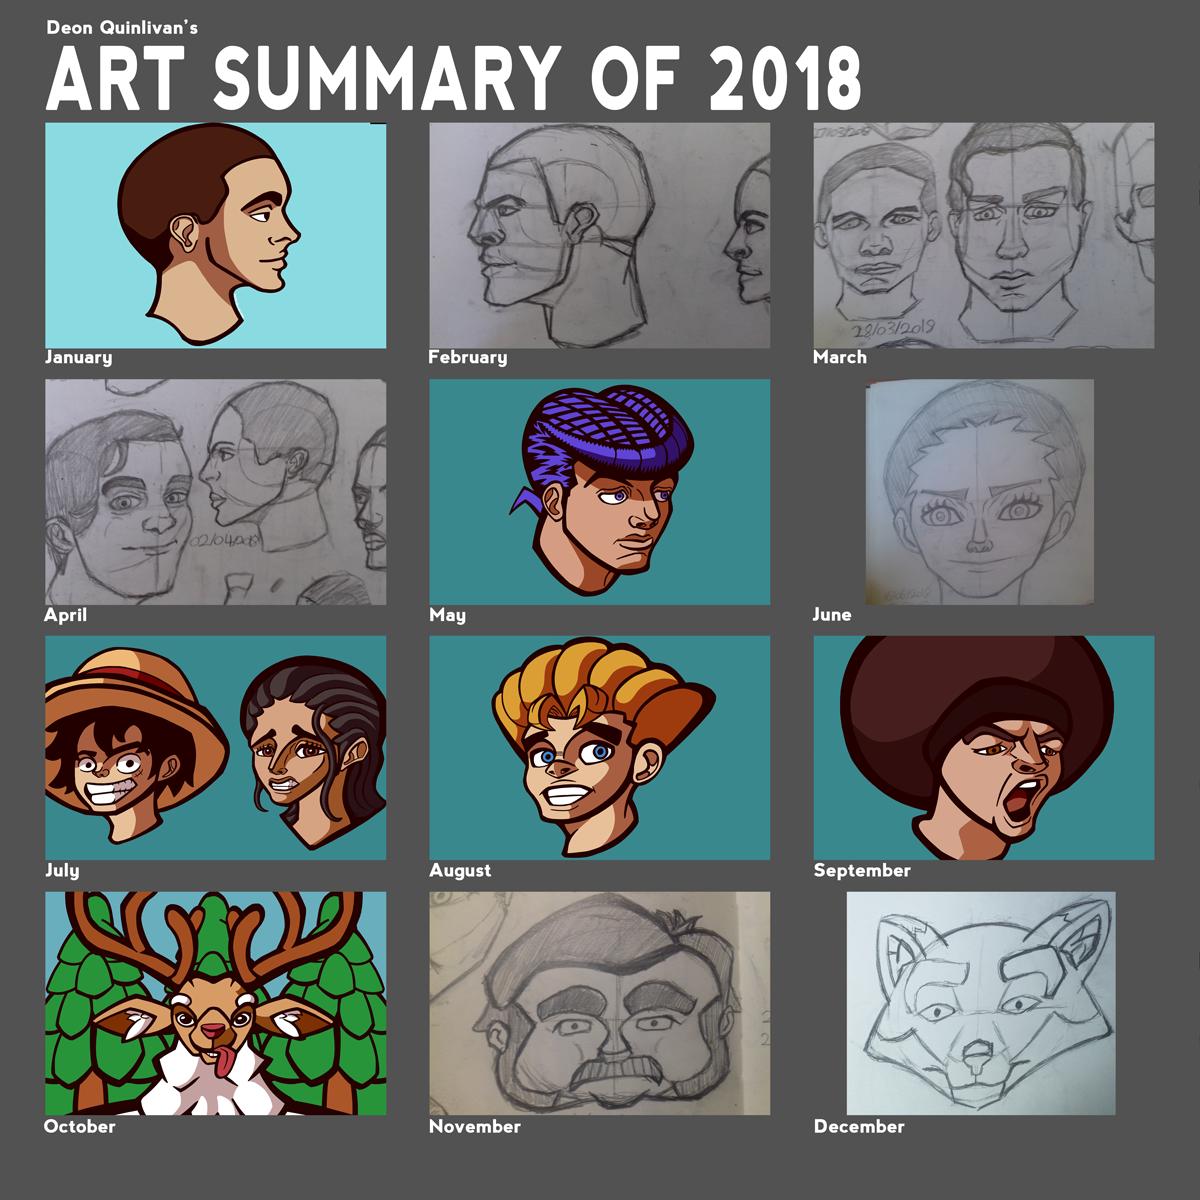 Art Summary of 2018